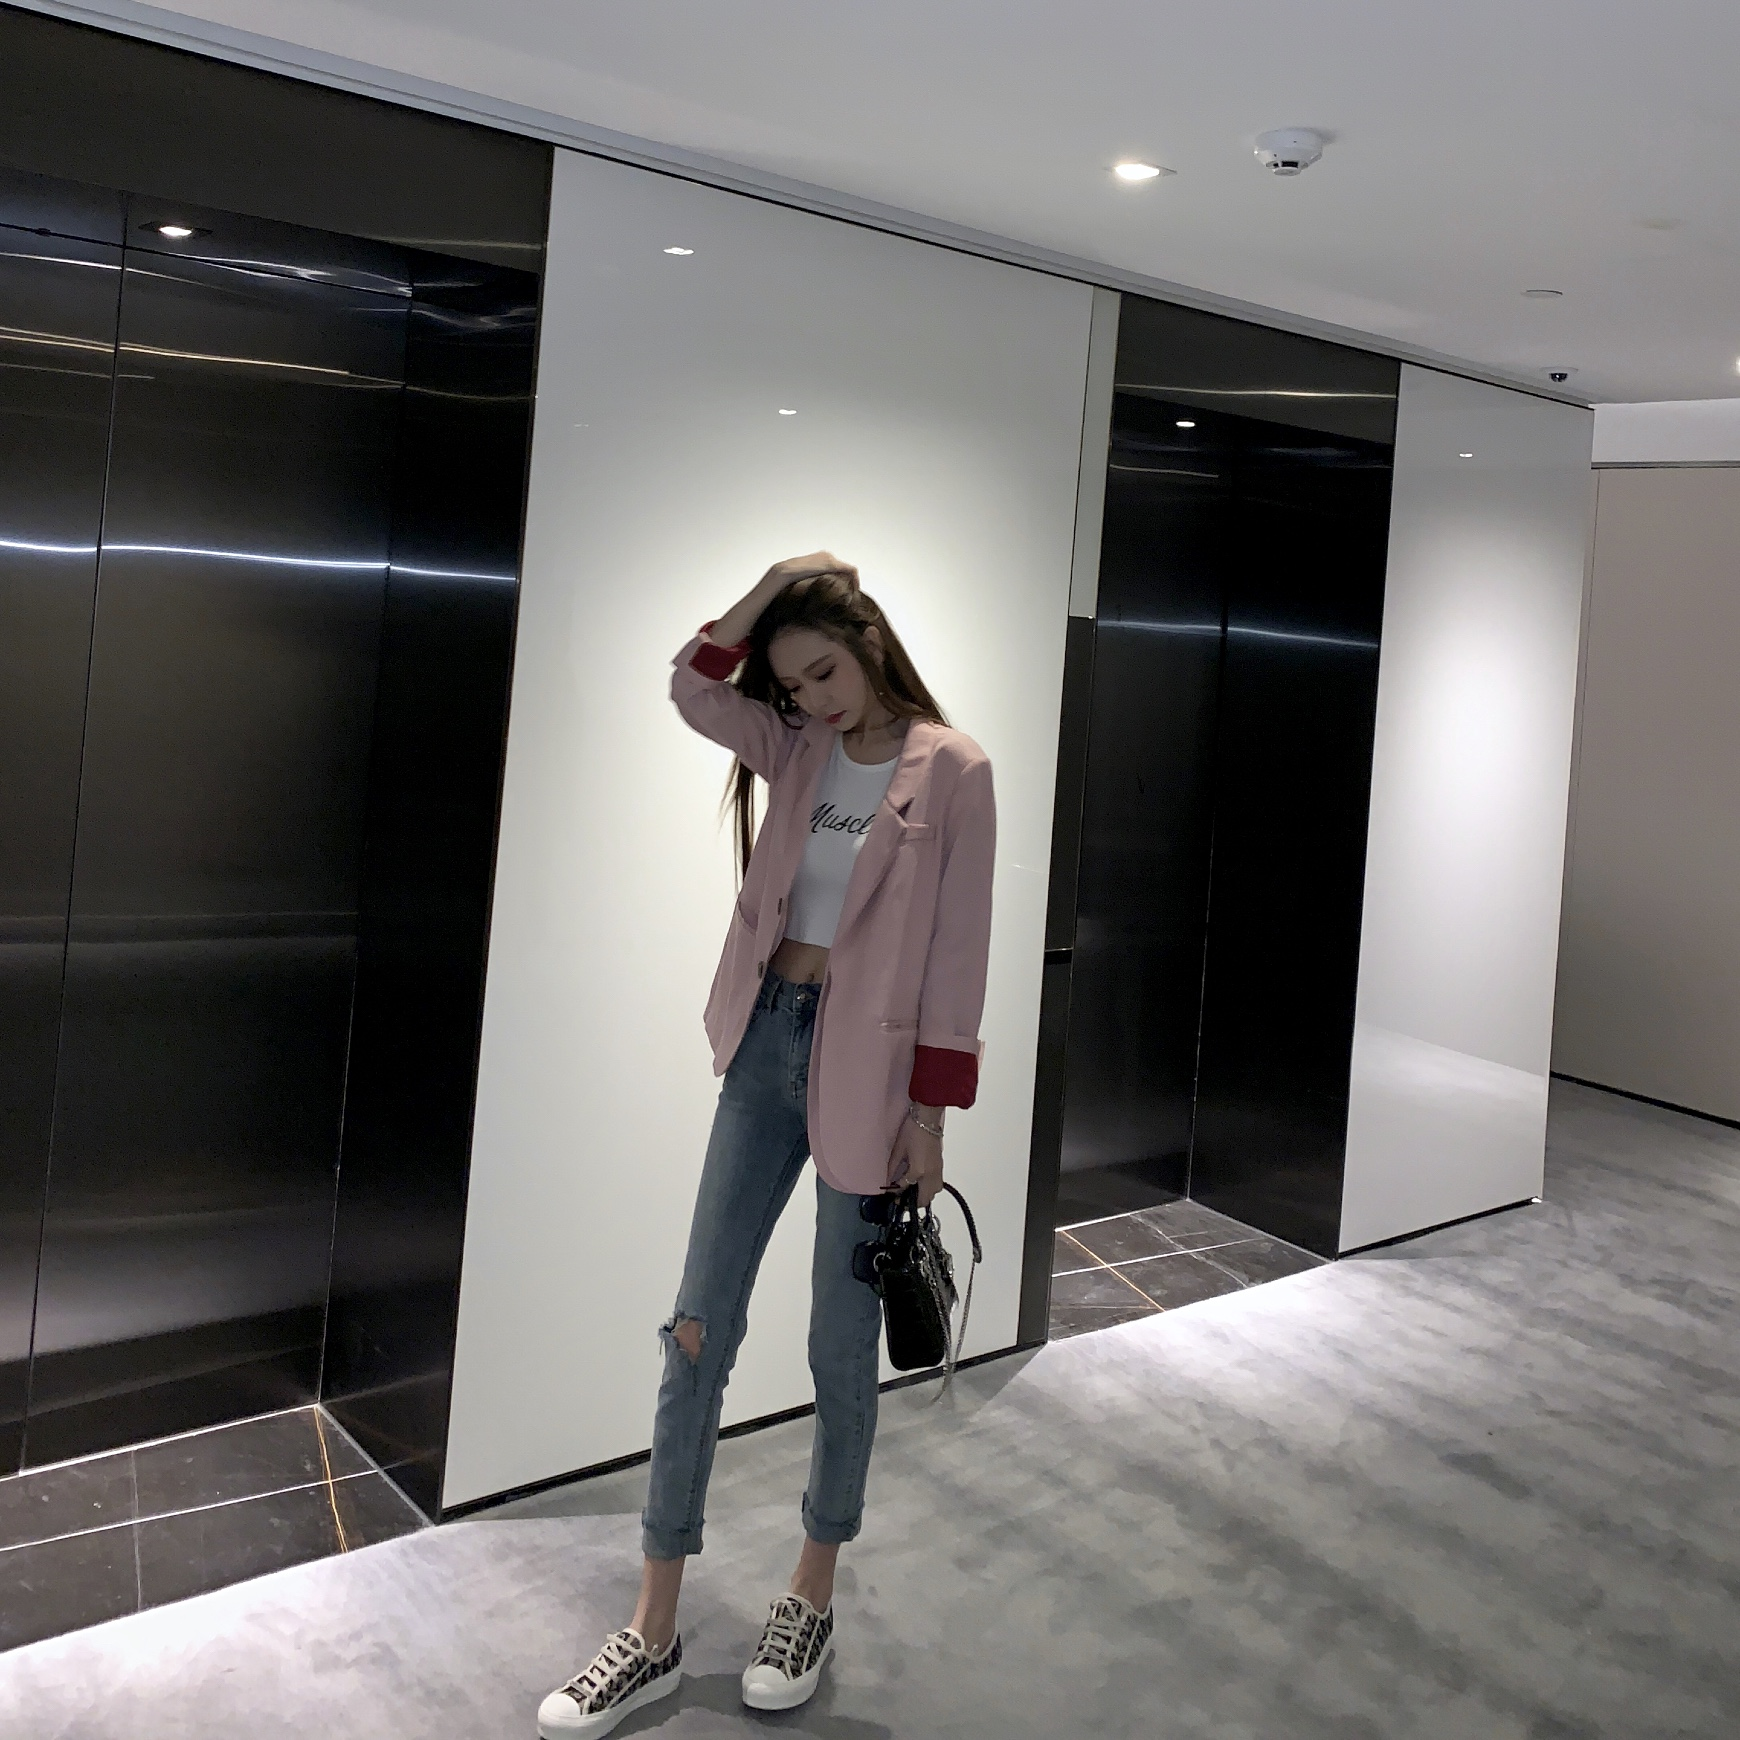 FBB李明萱2019春韩版休闲垂感网红小西装气质宽松chic西装外套女